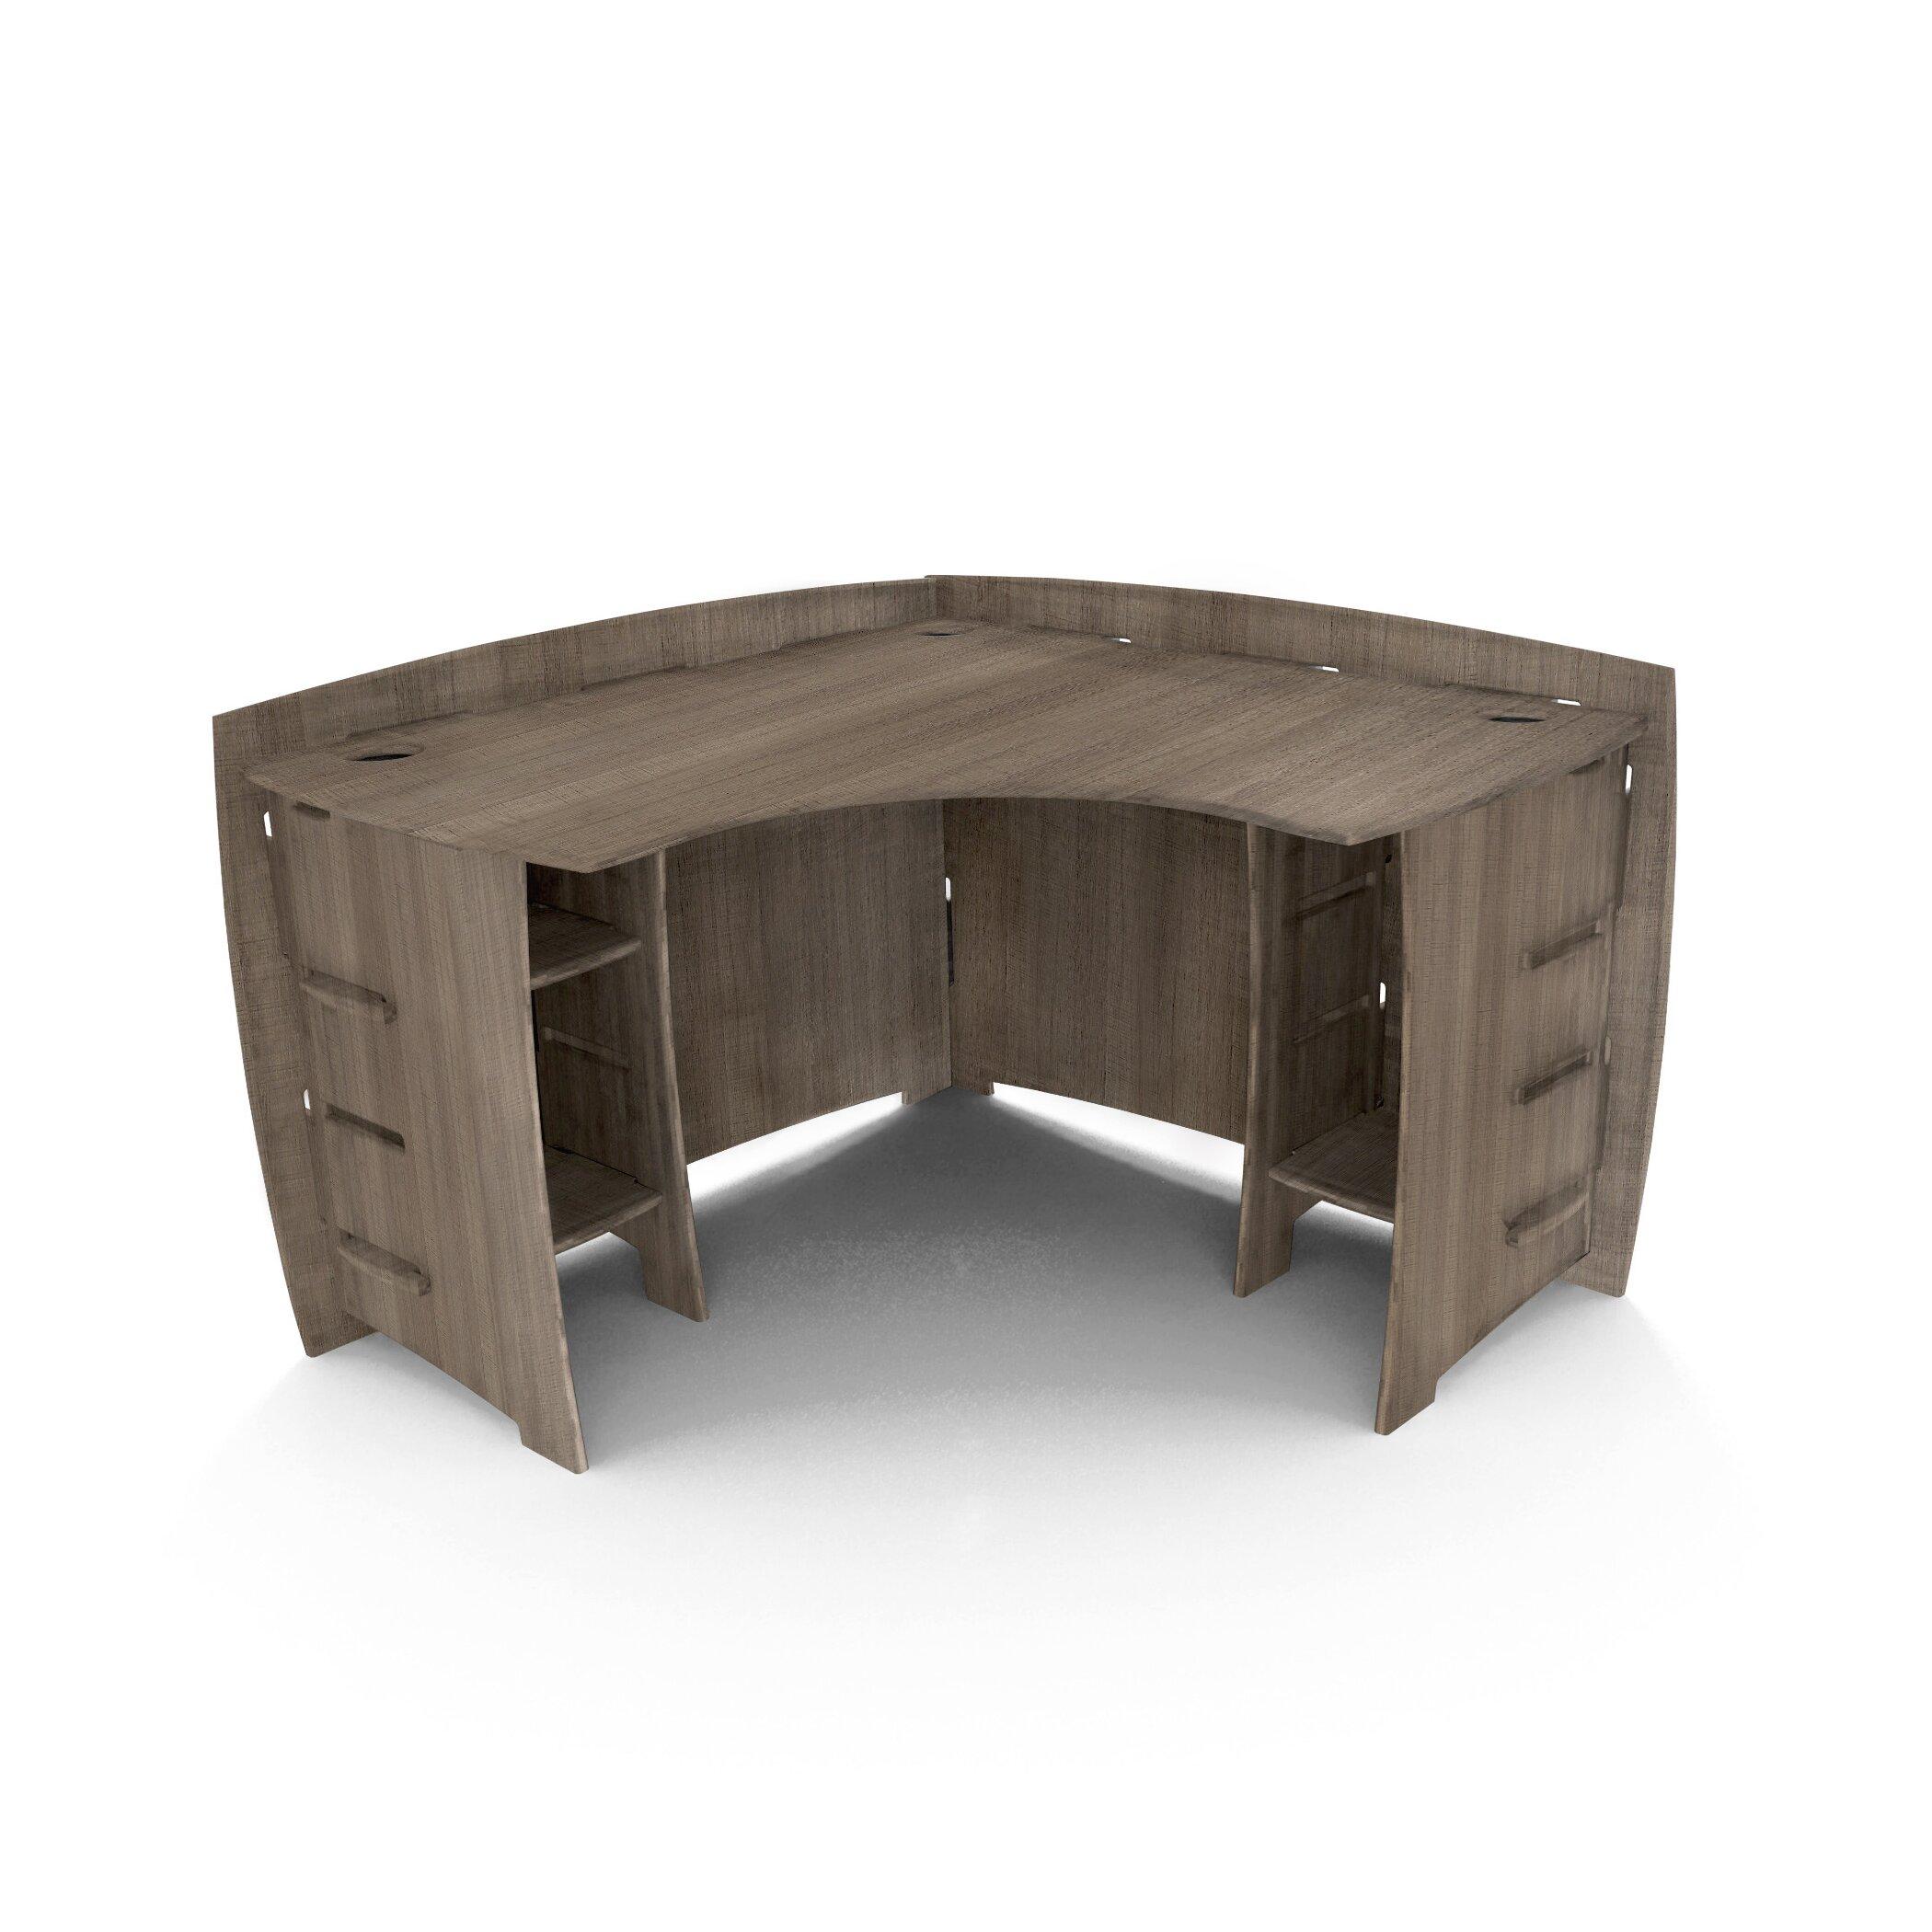 "Legare Furniture Driftwood 47"" Corner Executive Desk. Counter Height Table Ikea. Deskes. Tailgating Table. Chrome And Glass Desk. Diy Desk Chair. Taotronics Elune Tt Dl01 Dimmable Led Desk Lamp. Keyboard Workstation Desk. Desk Chair Back Pain"